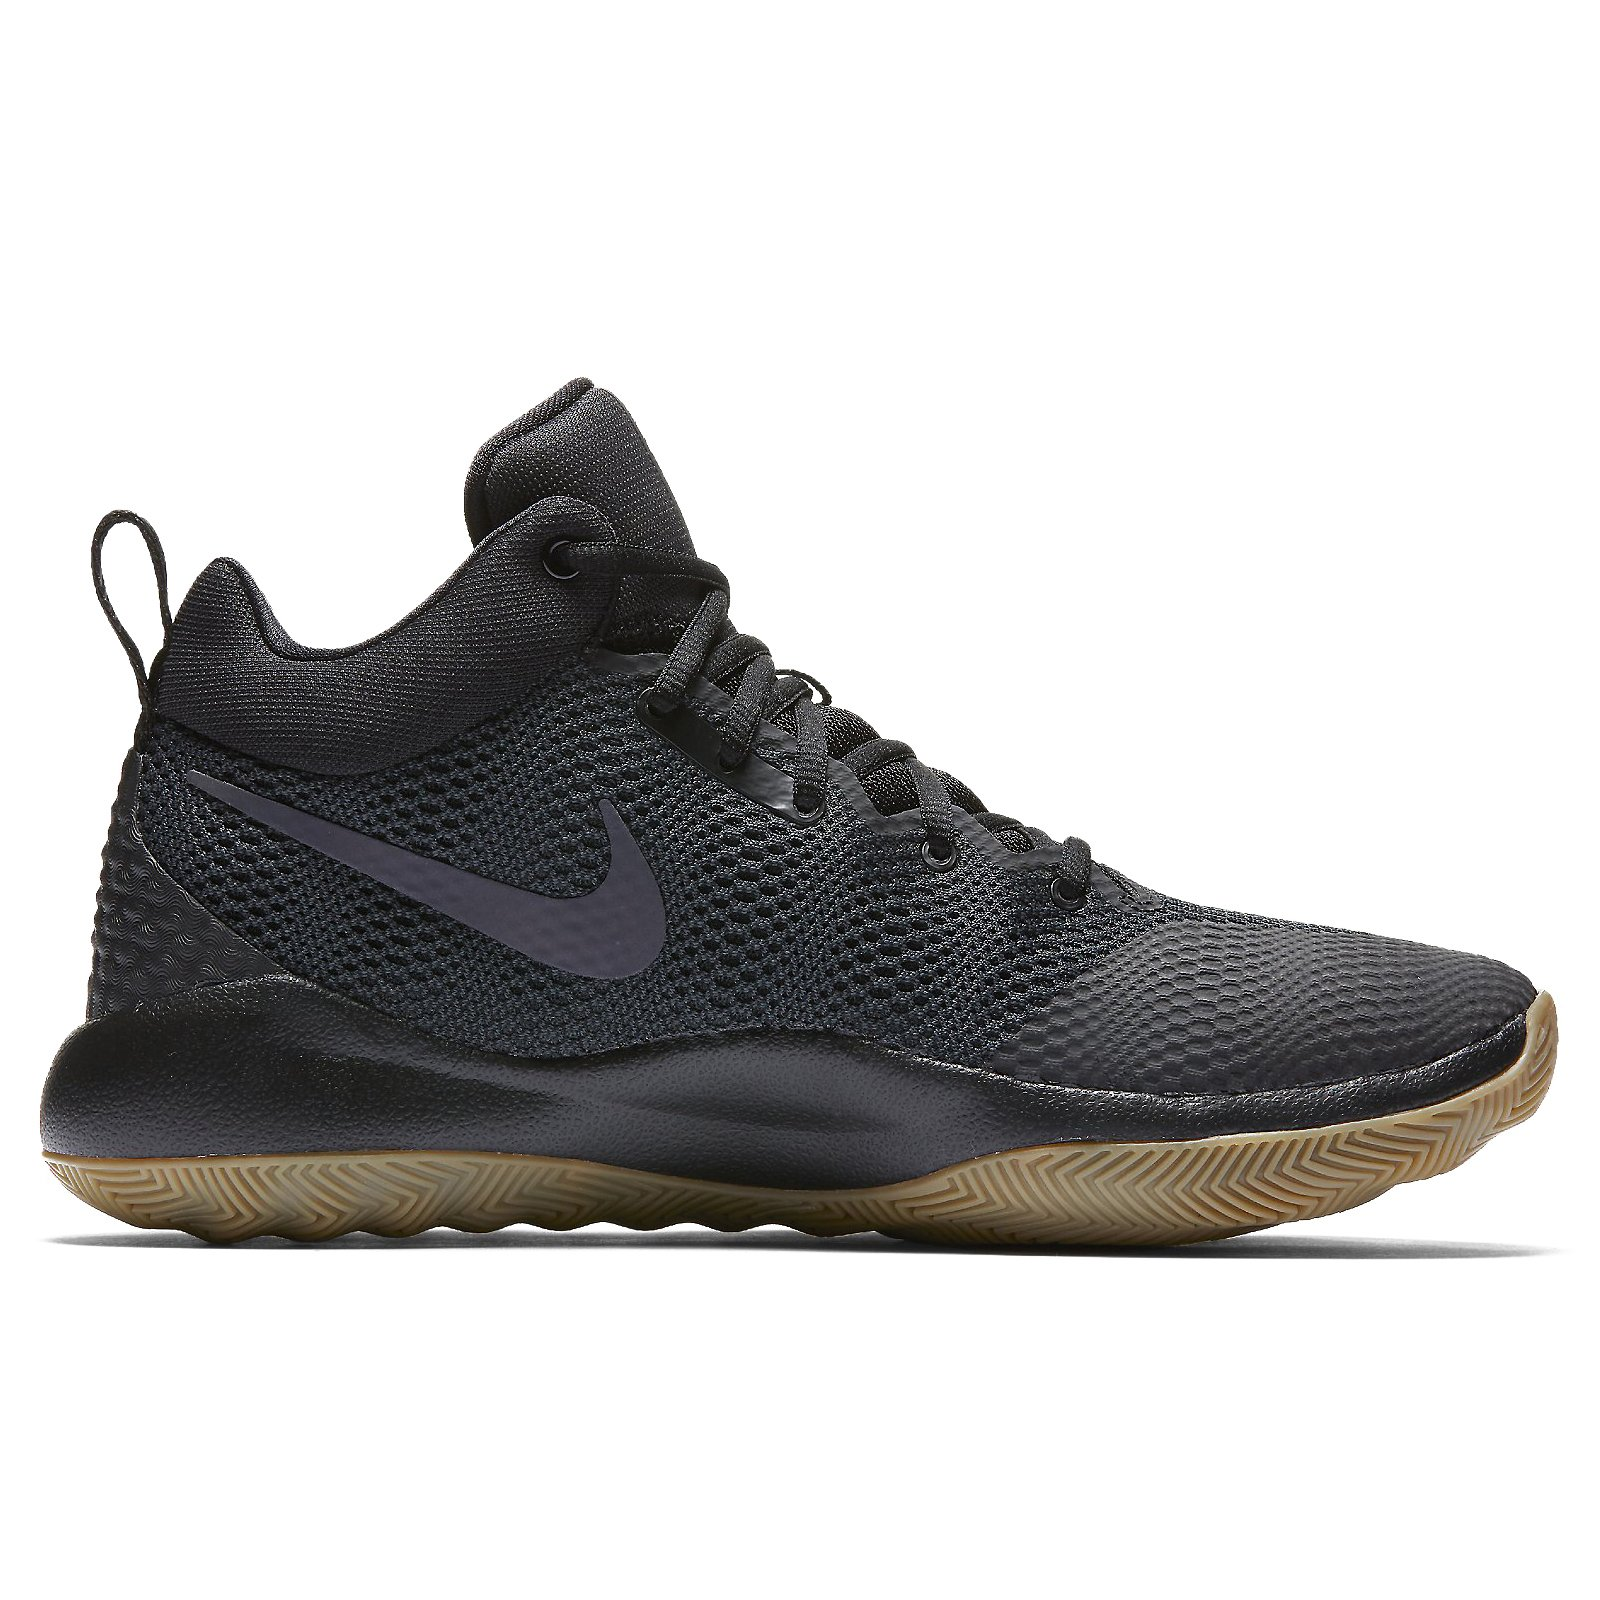 new concept 9fa90 1ff65 Galleon - Nike Mens Zoom Rev 2017 Basketball Shoe BLACK ANTHRACITE-GUM  LIGHT BROWN 10 D(M) US